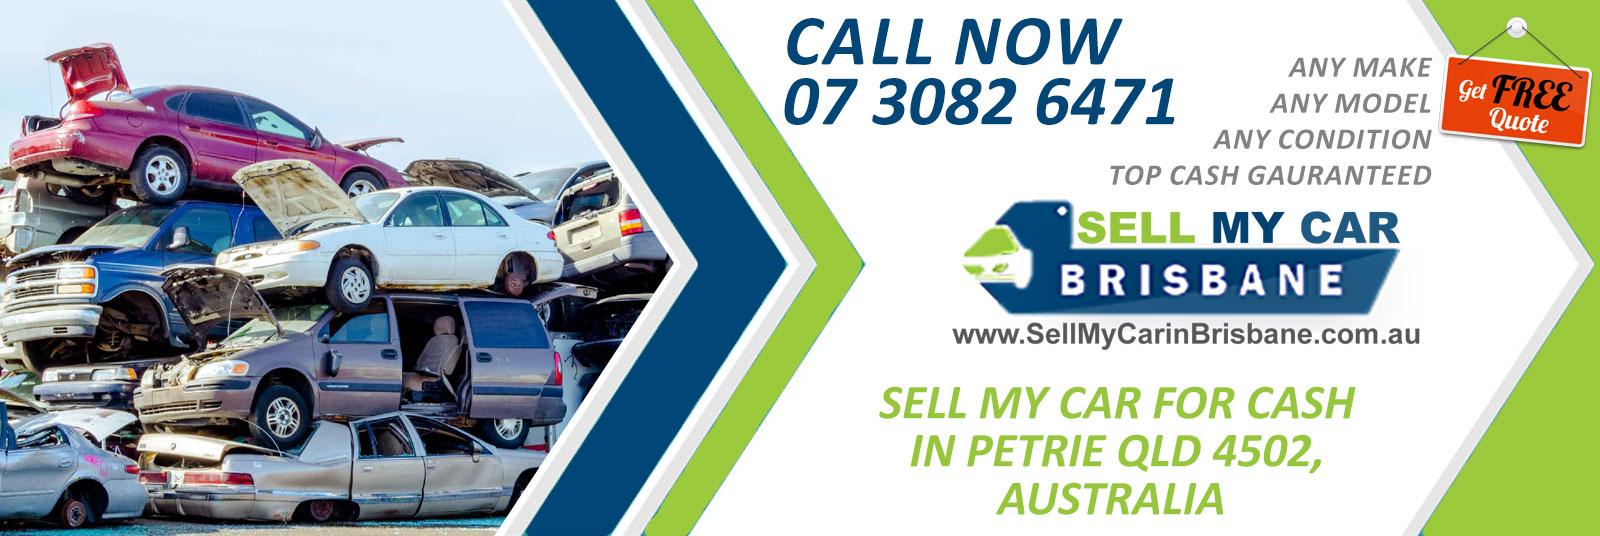 Sell my Car in Petrie